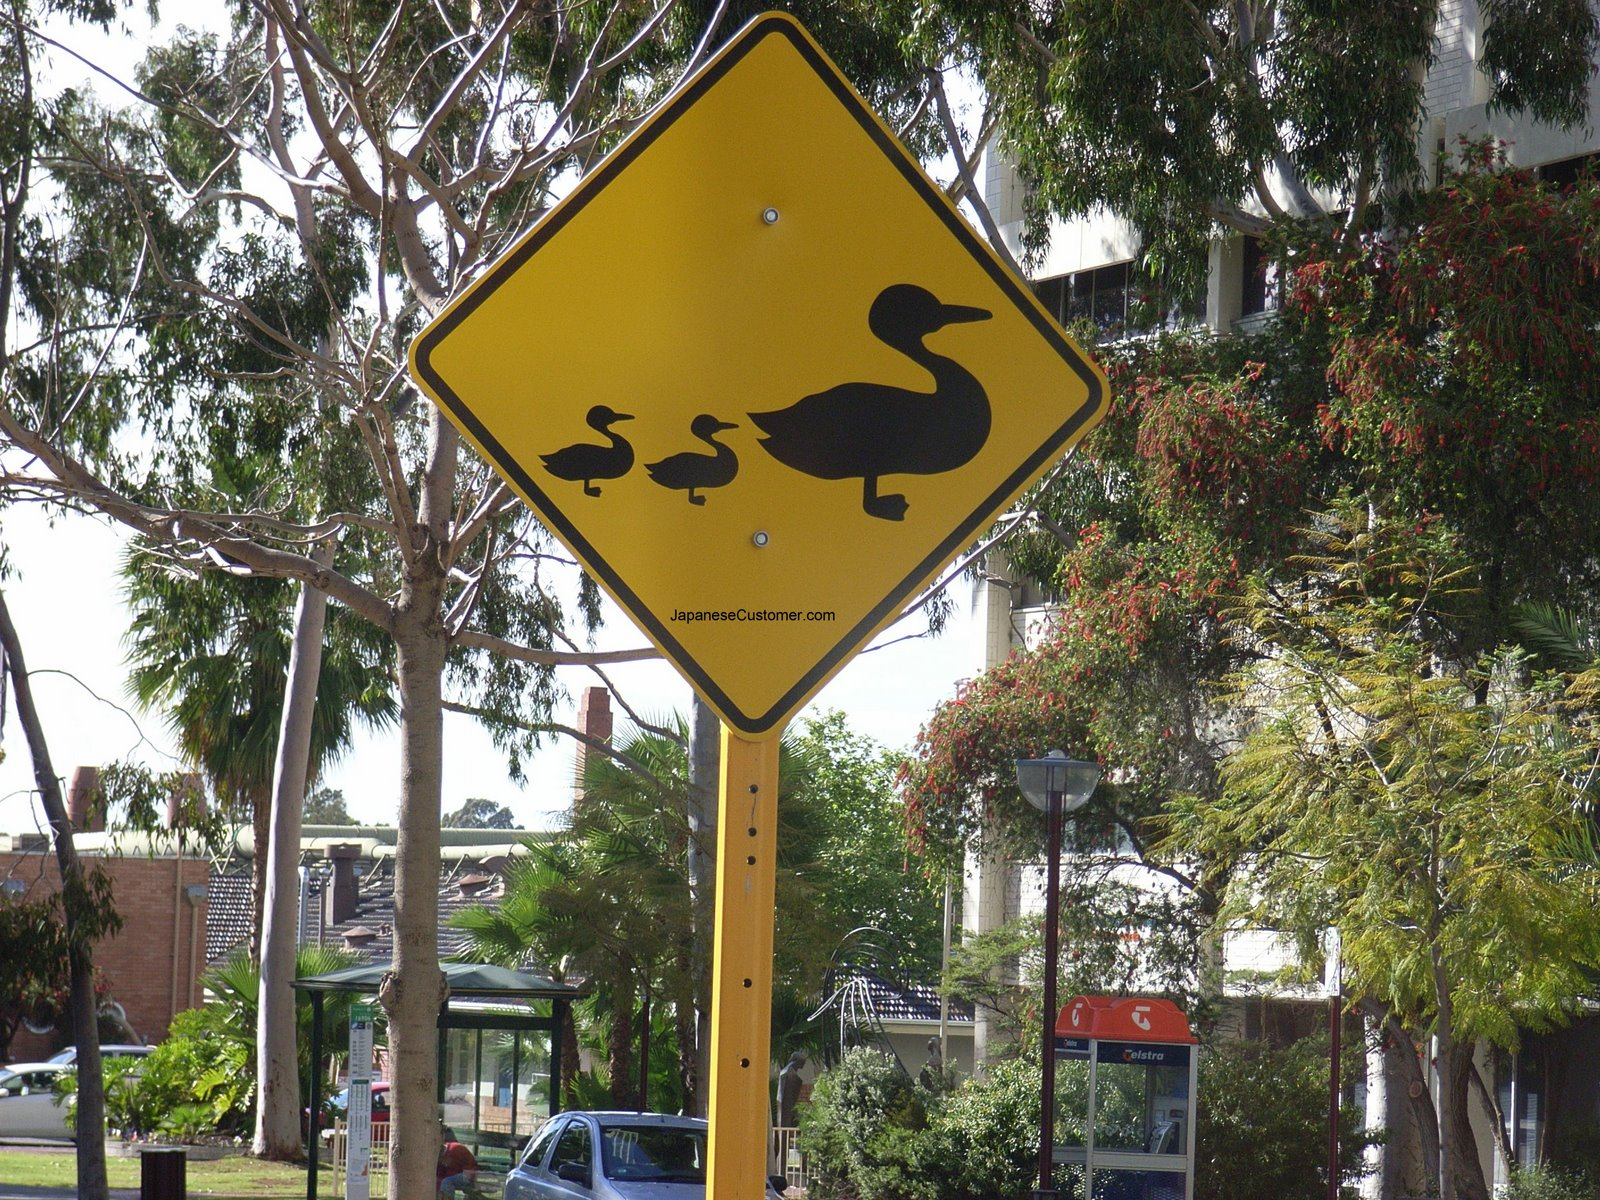 Suburban street scene, Australia Copyright 2006